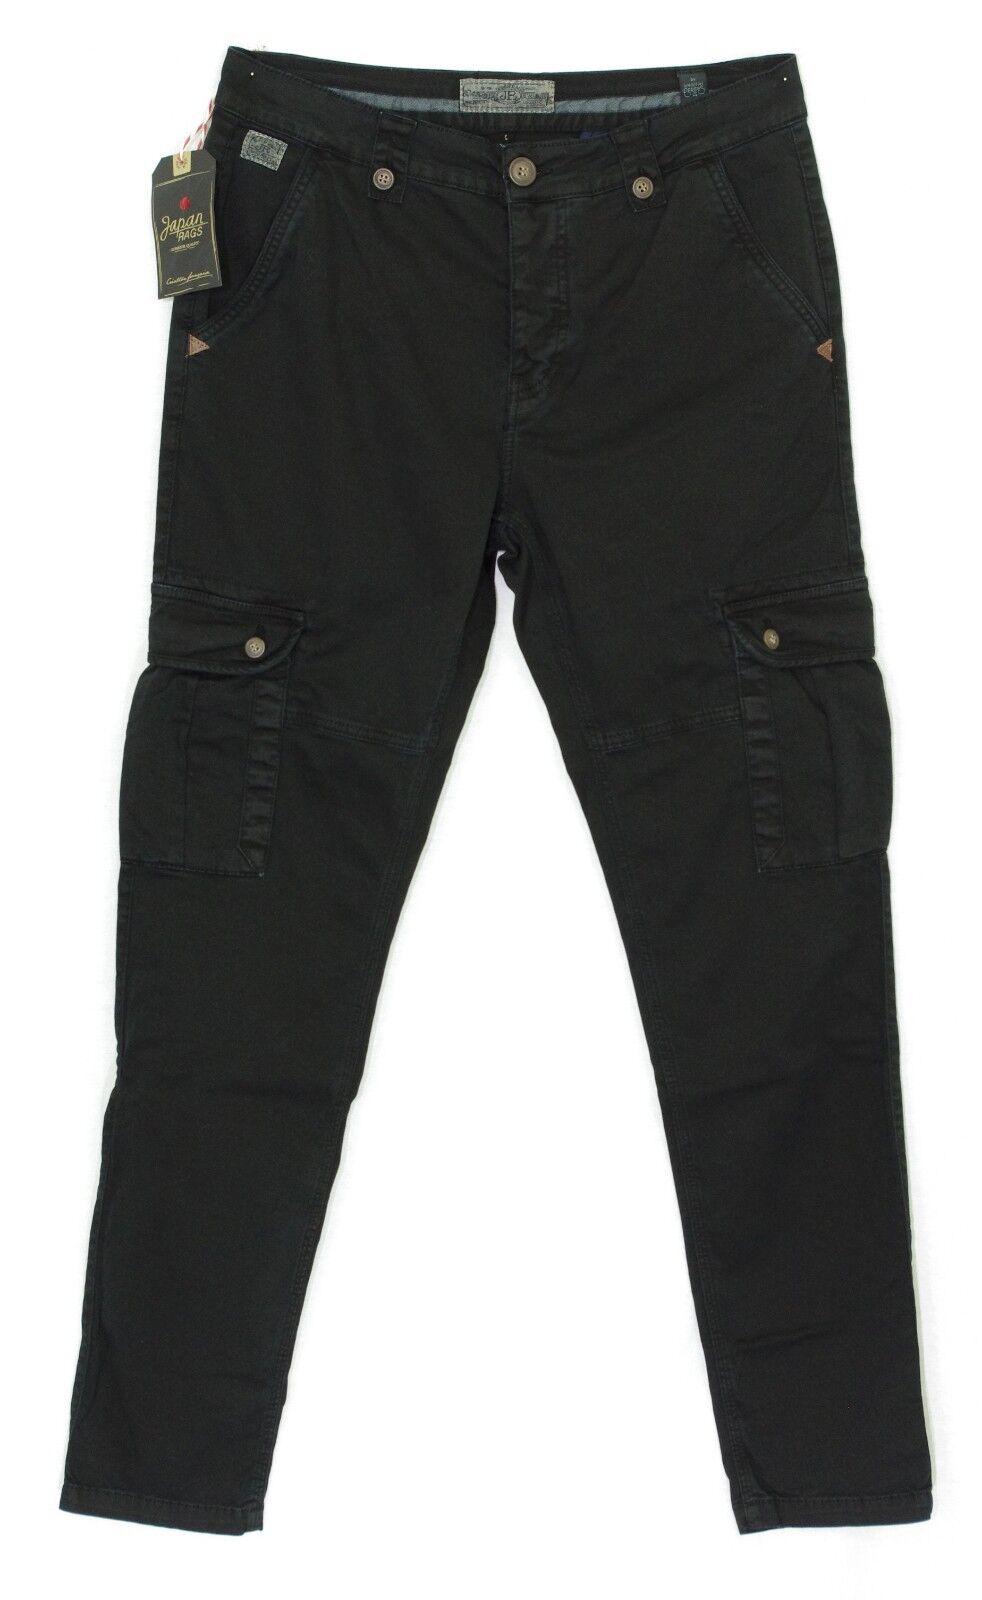 Ebay Pantalon Treillis Noir Tom Homme Japan Rags Cargo Black nTgfqFnawx